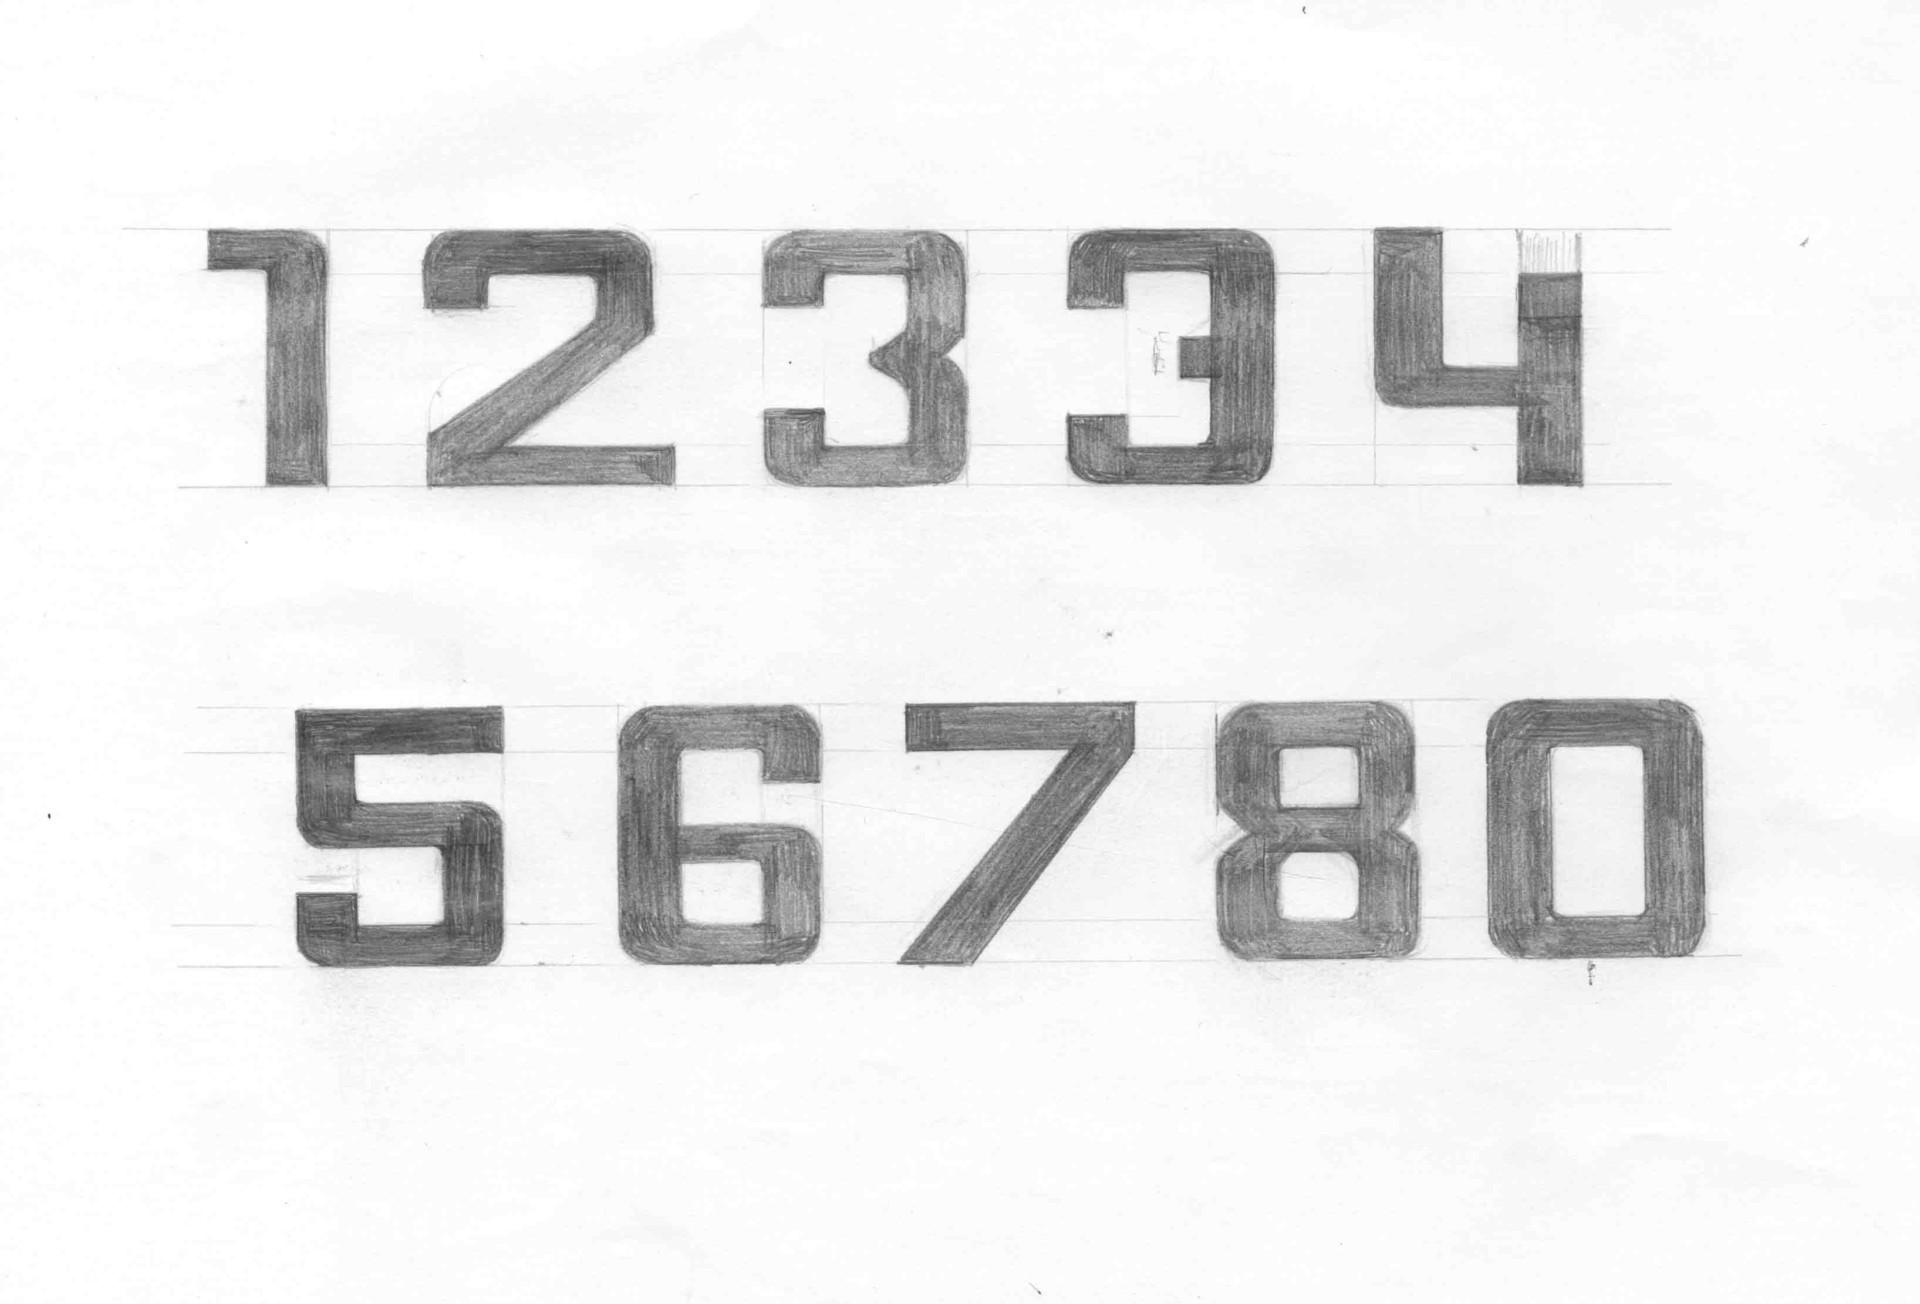 Merle Michaelis / Lettering & Typografie Chevy